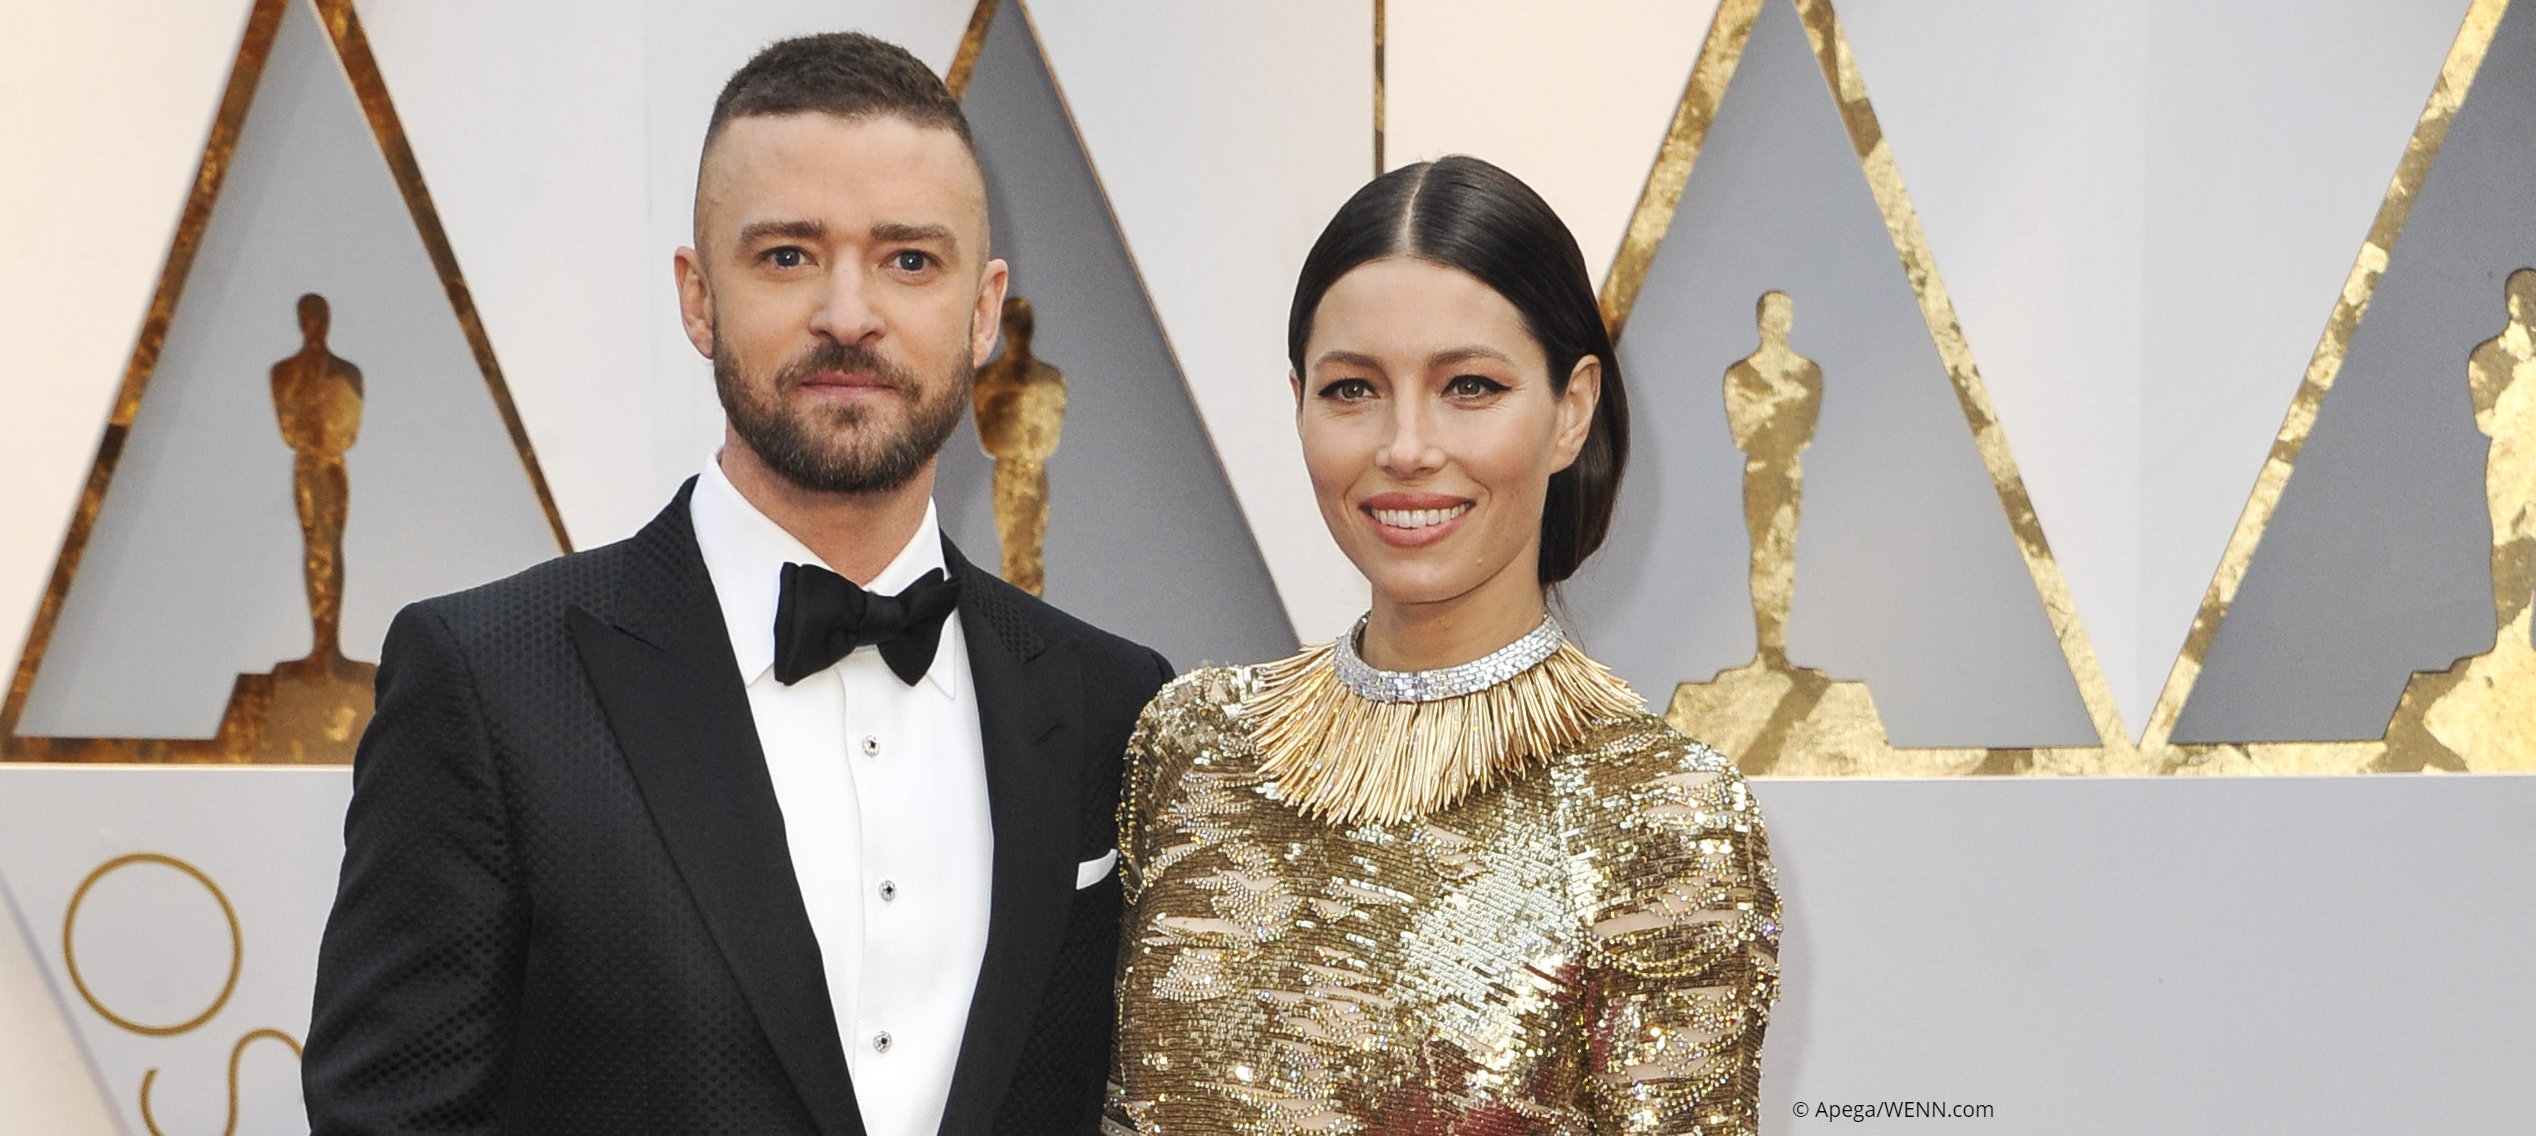 Get the Look: Justin Timberlake